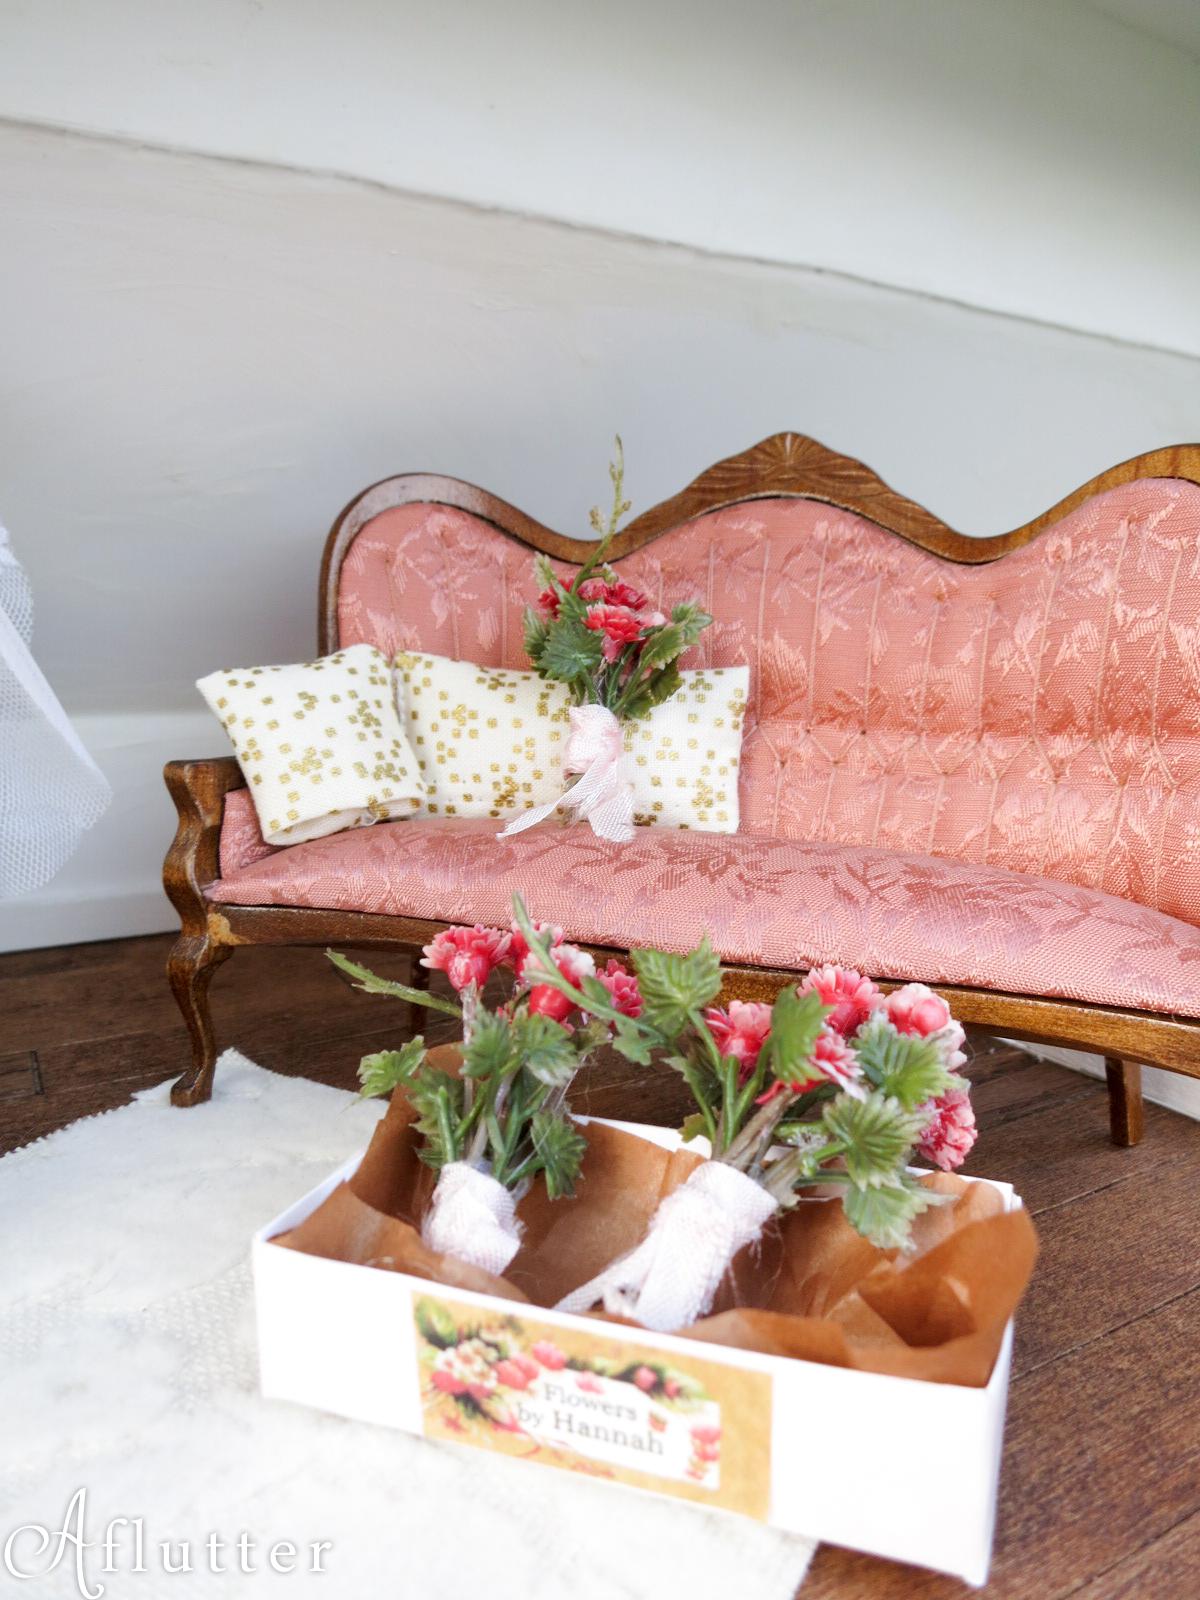 Brenul-Barn-Mini-Wedding-10-of-16.jpg